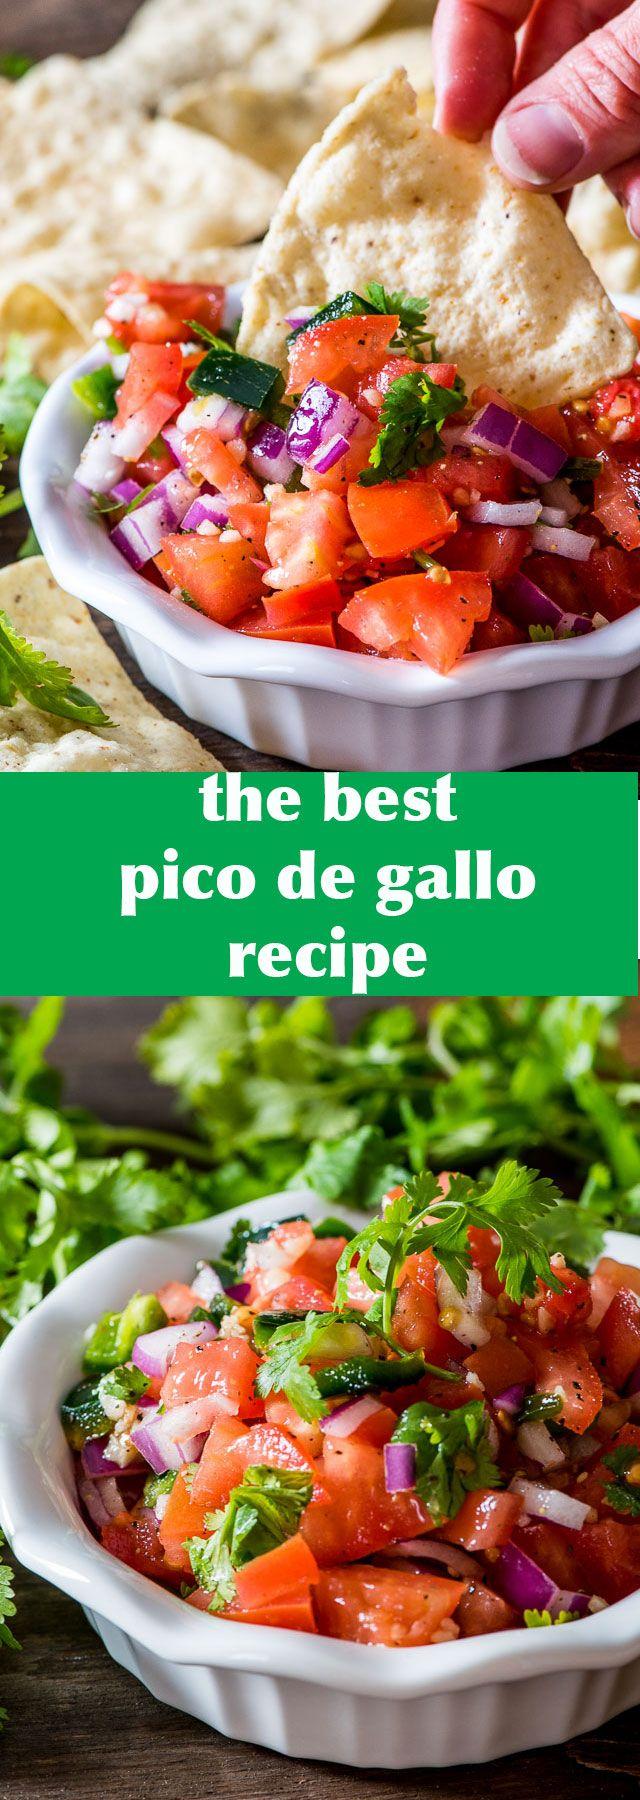 The best pico de gallo recipe around. Fresh tomato, onion, peppers, cilantro and garlic with a splash of lime.